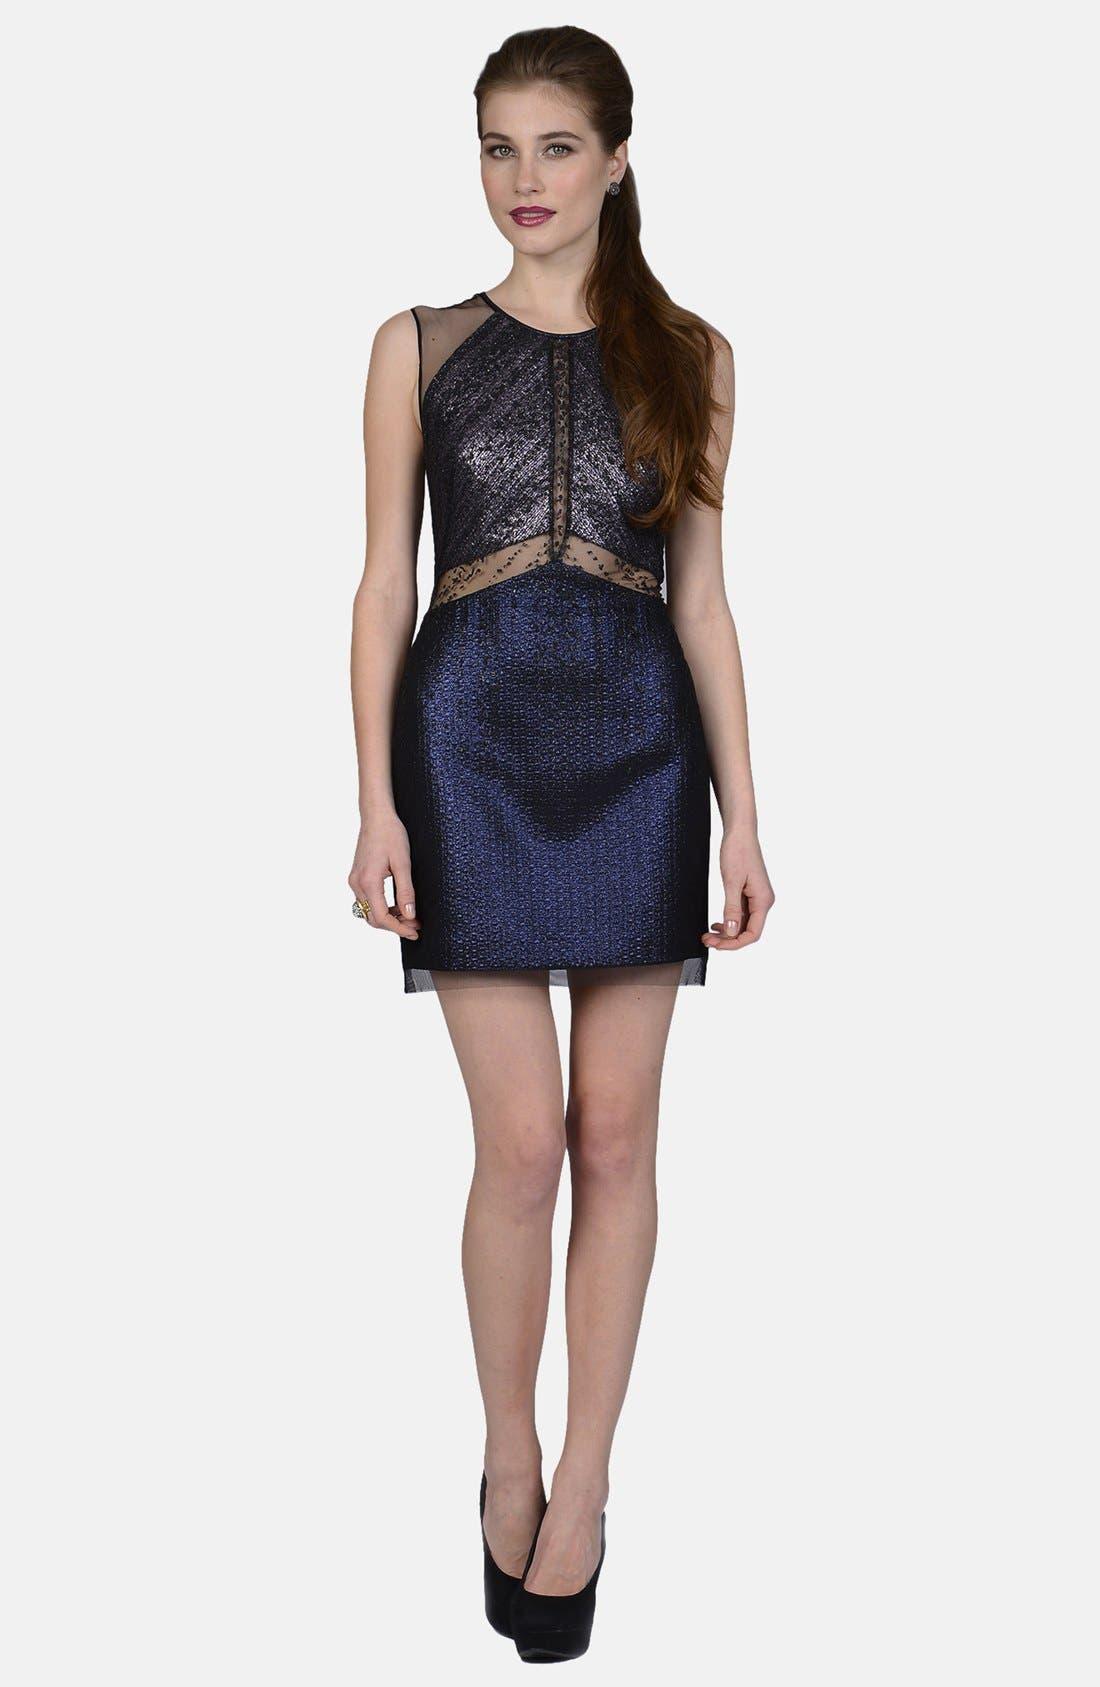 PHOEBE by Kay Unger Mixed Media Sheath Dress, Main, color, 002